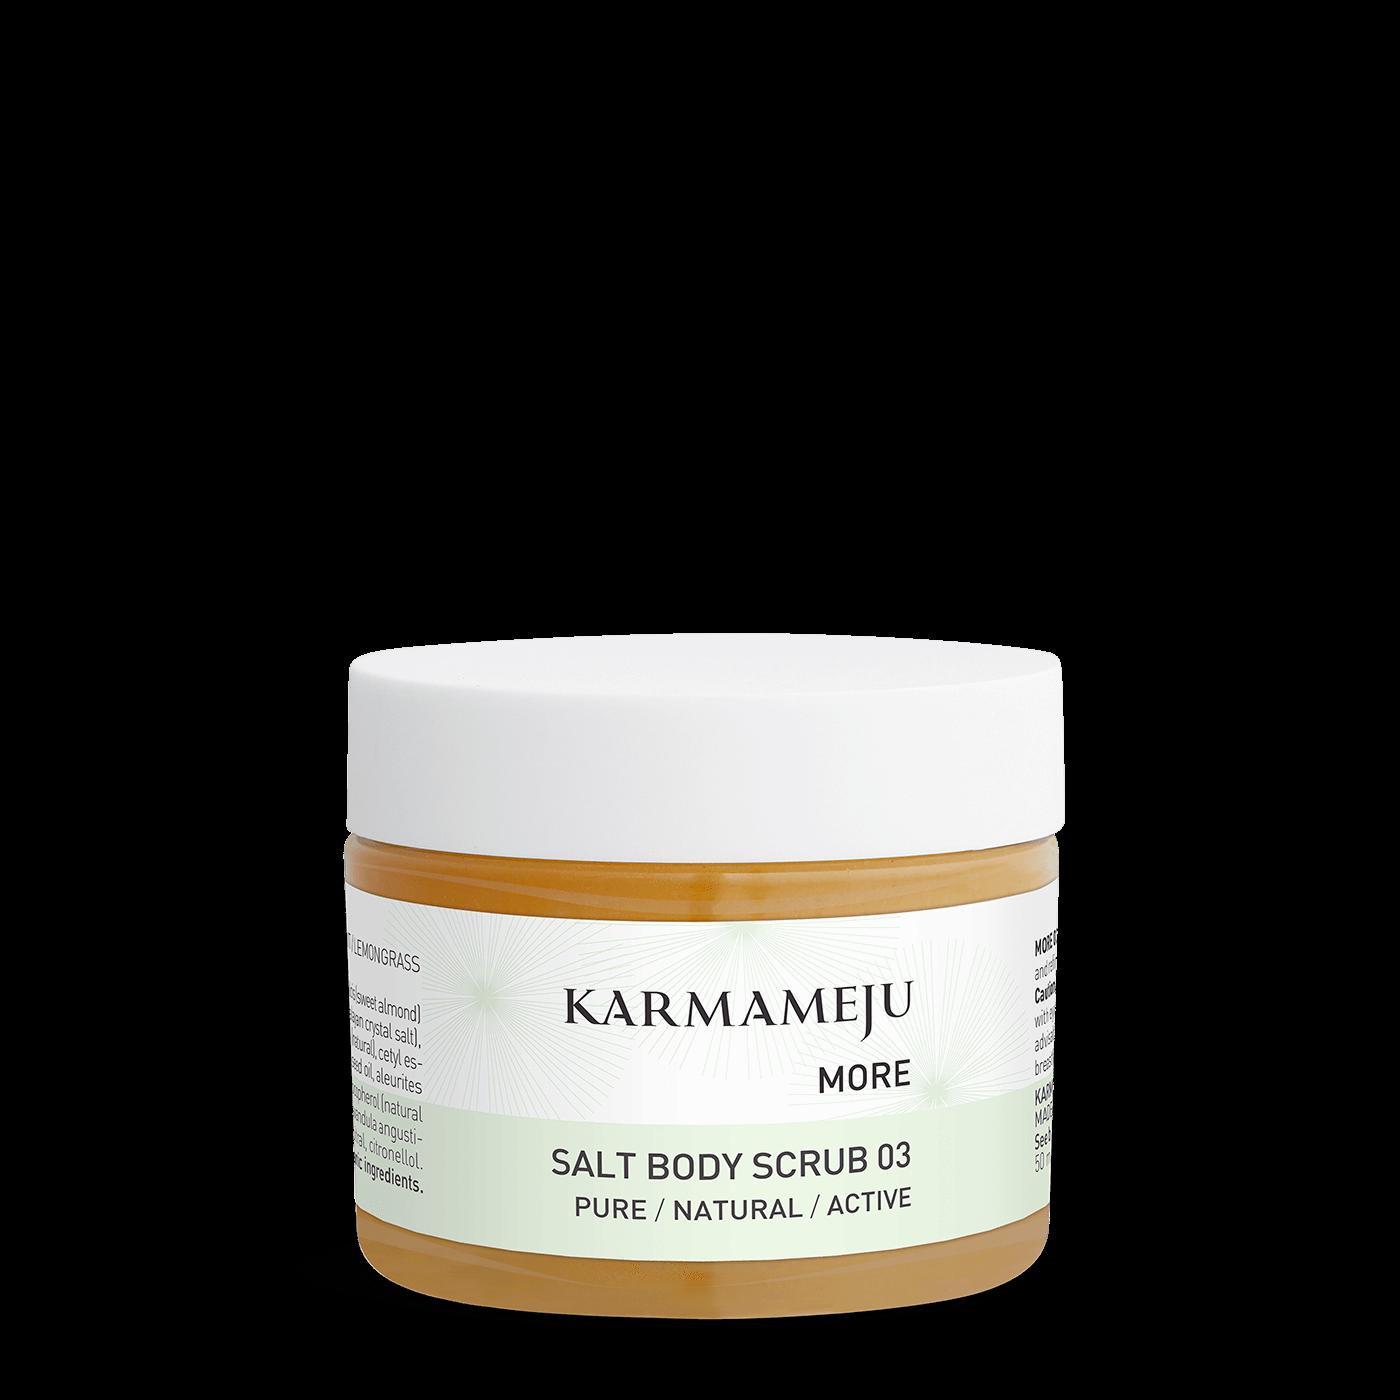 Karmameju MORE / SALT BODY SCRUB 03 - Travel size